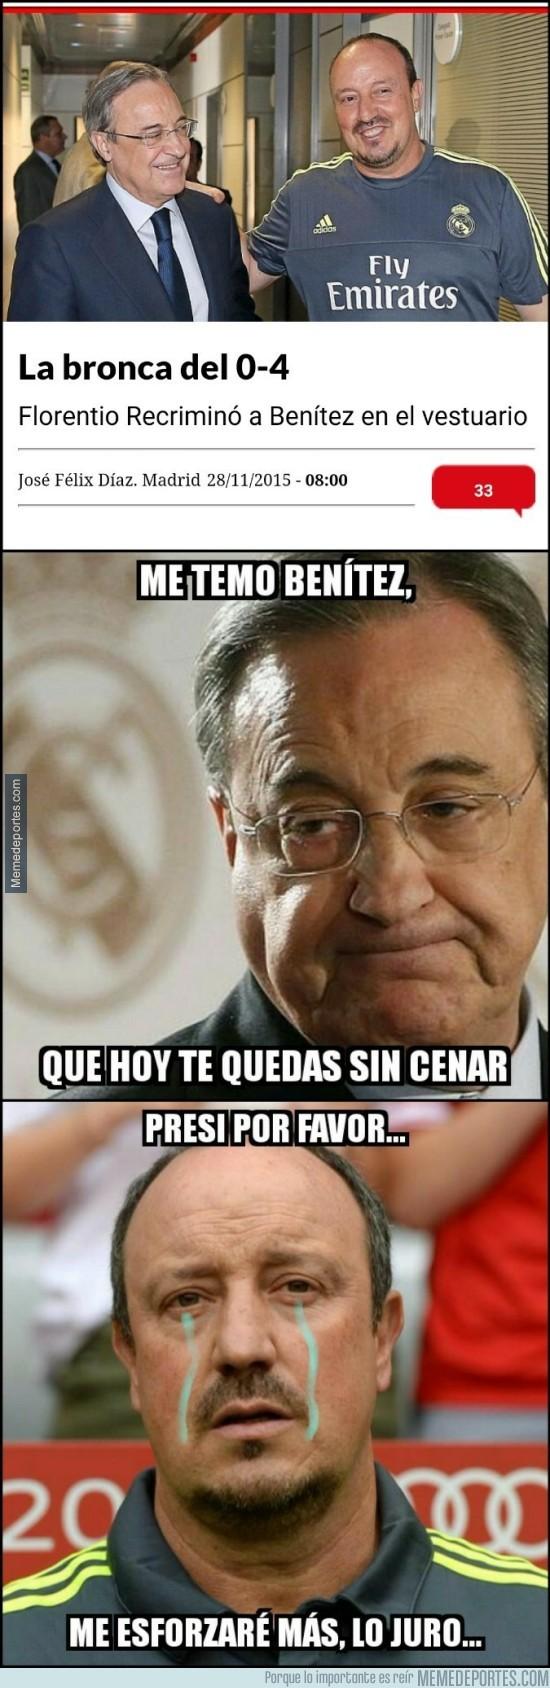 744890 - Florentino Pérez siendo muy cruel con Benítez tras el 0-4 del Barça